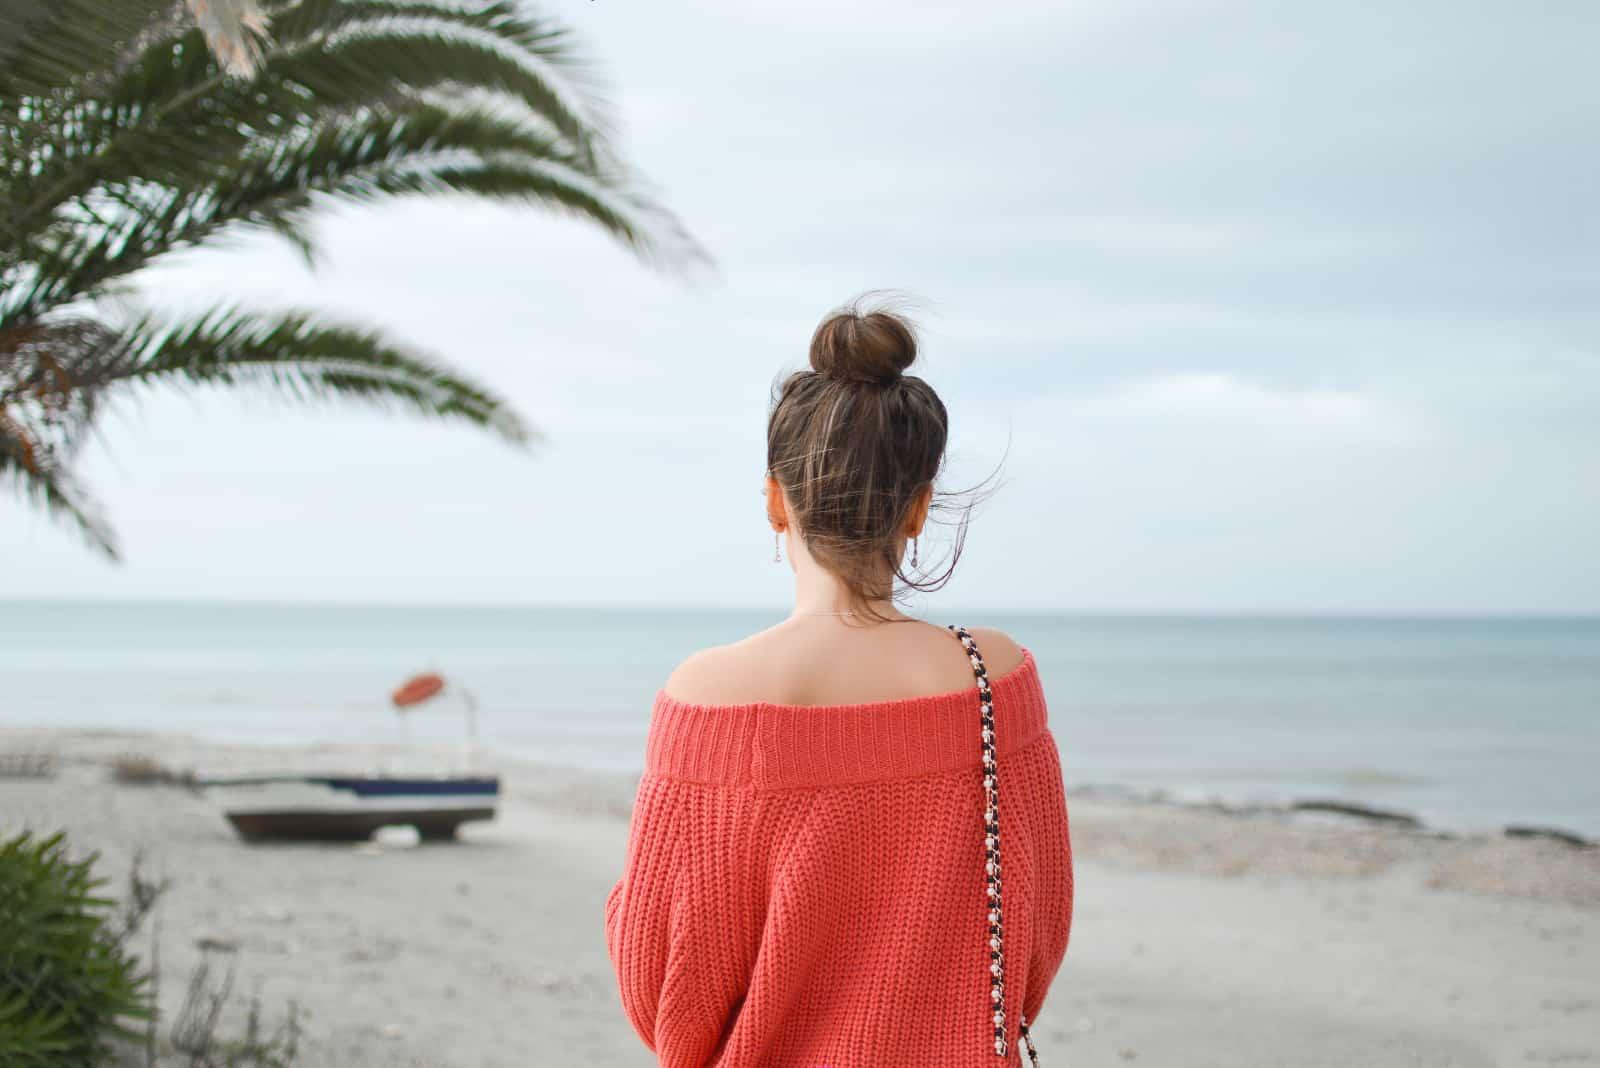 femme en pull rouge regardant la mer